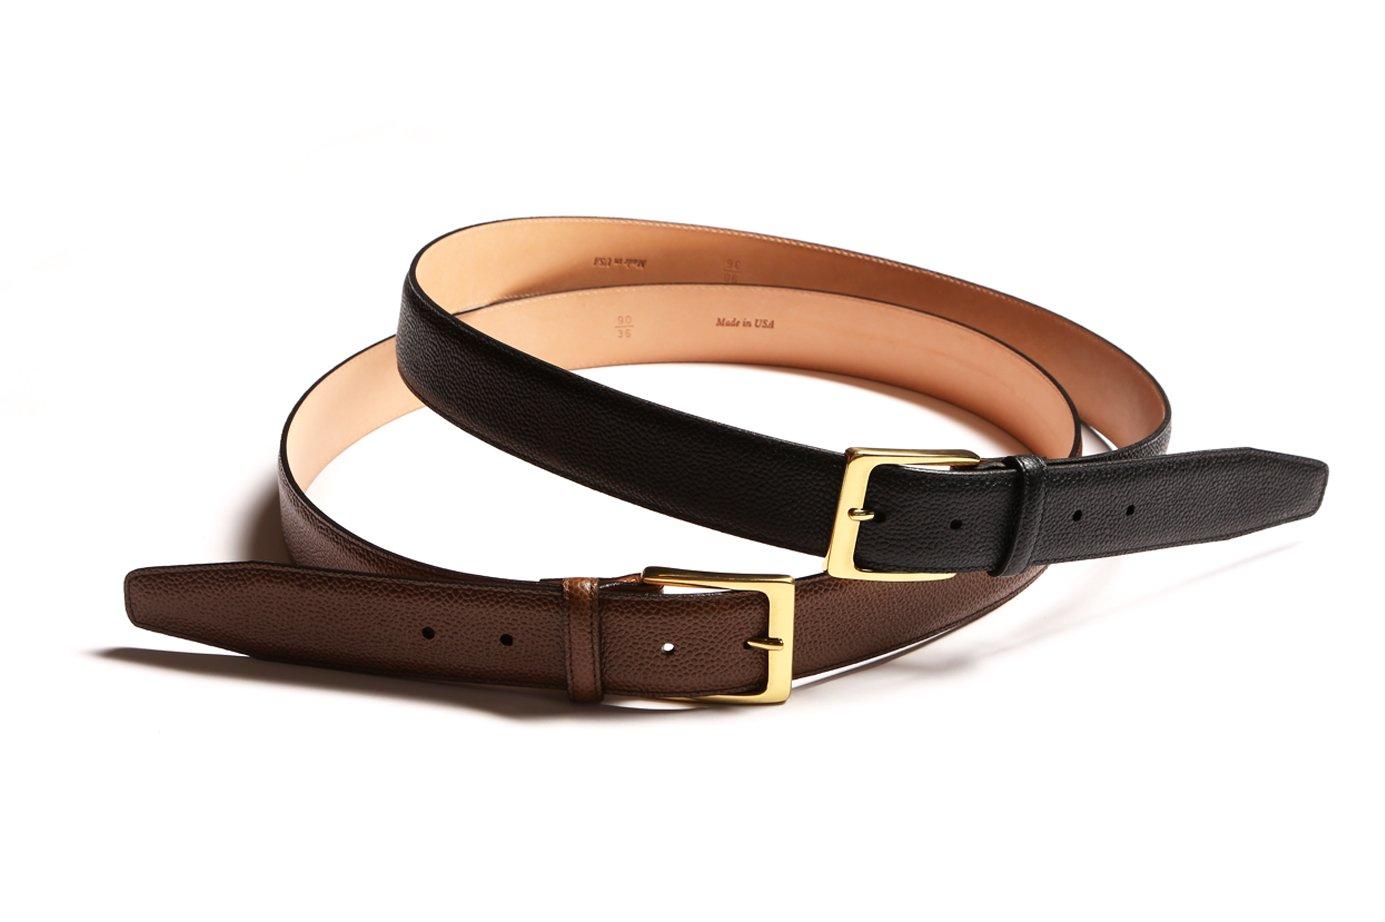 Scotch Grain Leather Belt Frank Clegg?_mignore=1